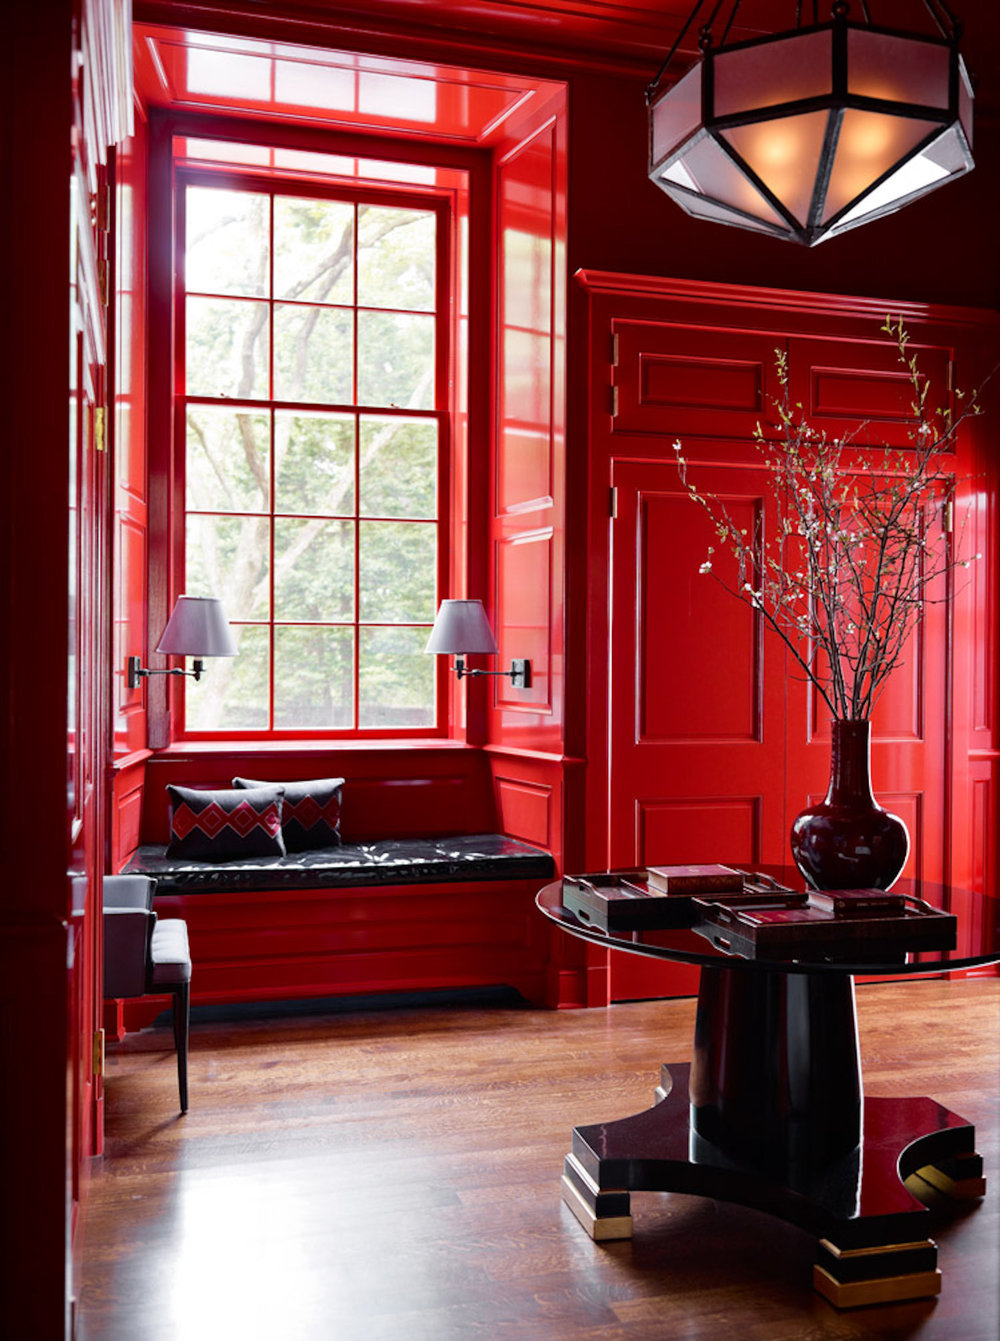 0901_red hall.jpg